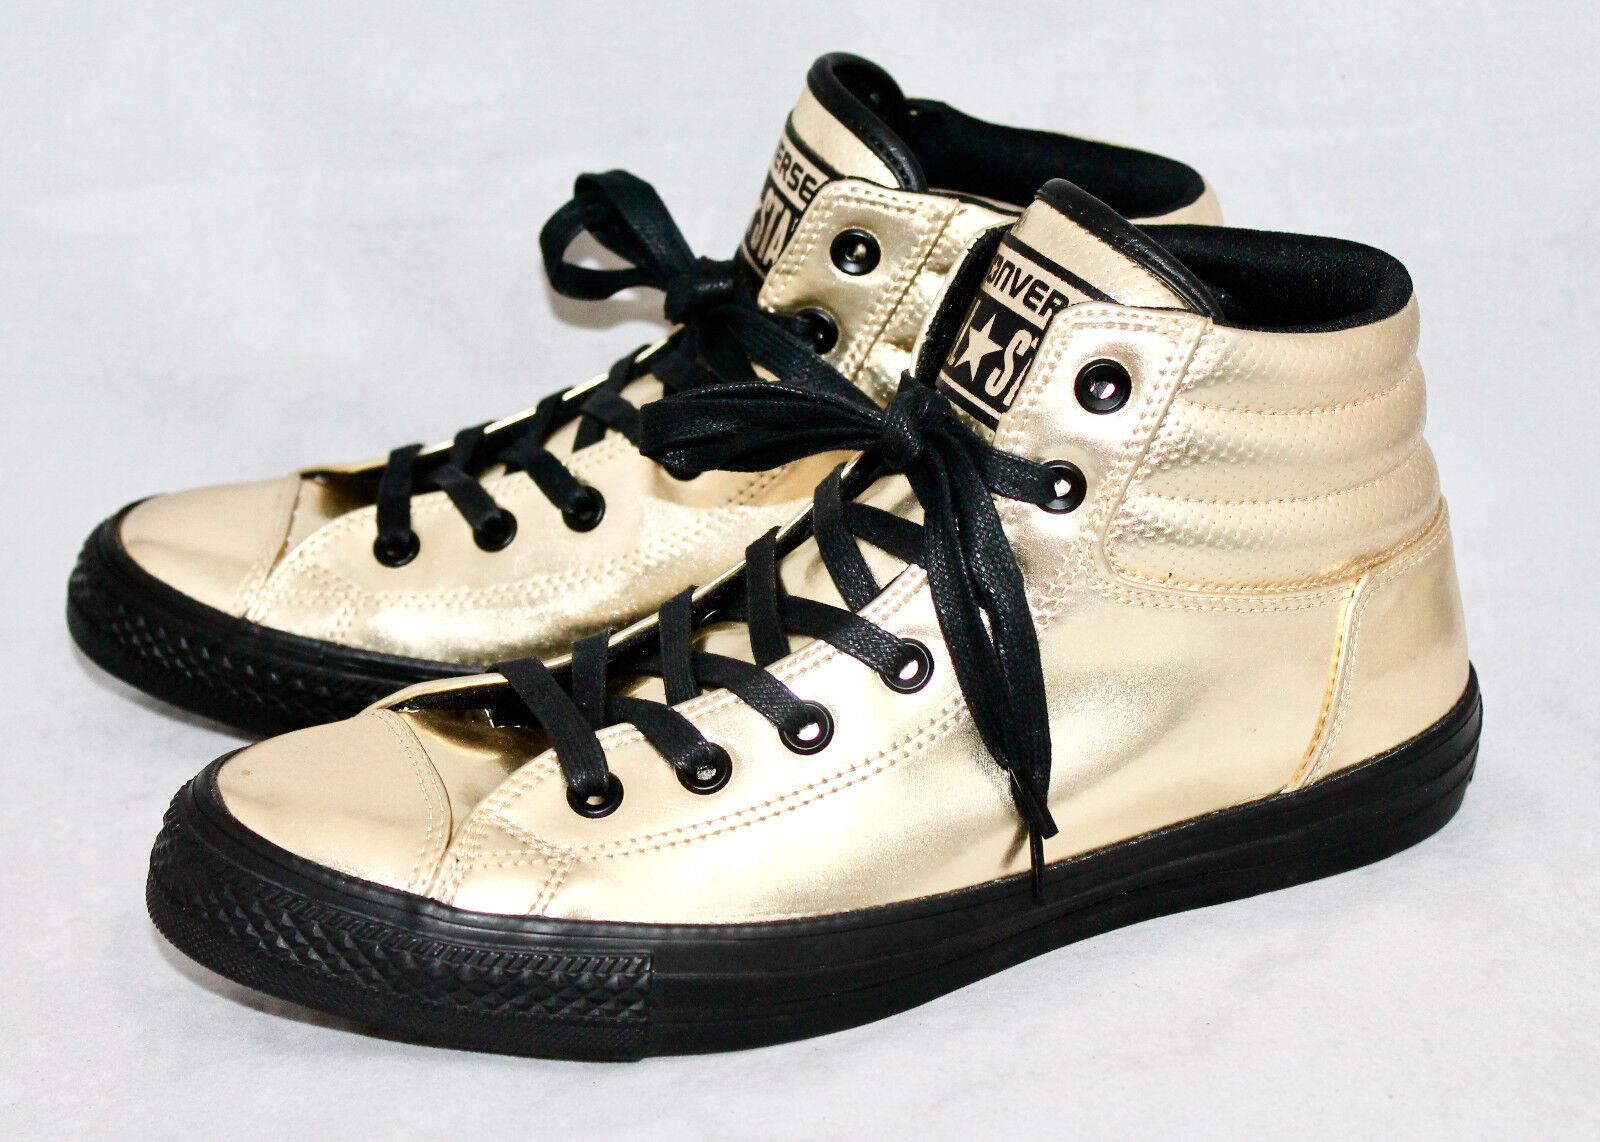 CONVERSE 152659C All Star Fresh Homme 10 Doré Mirror Hi Top Sneakers